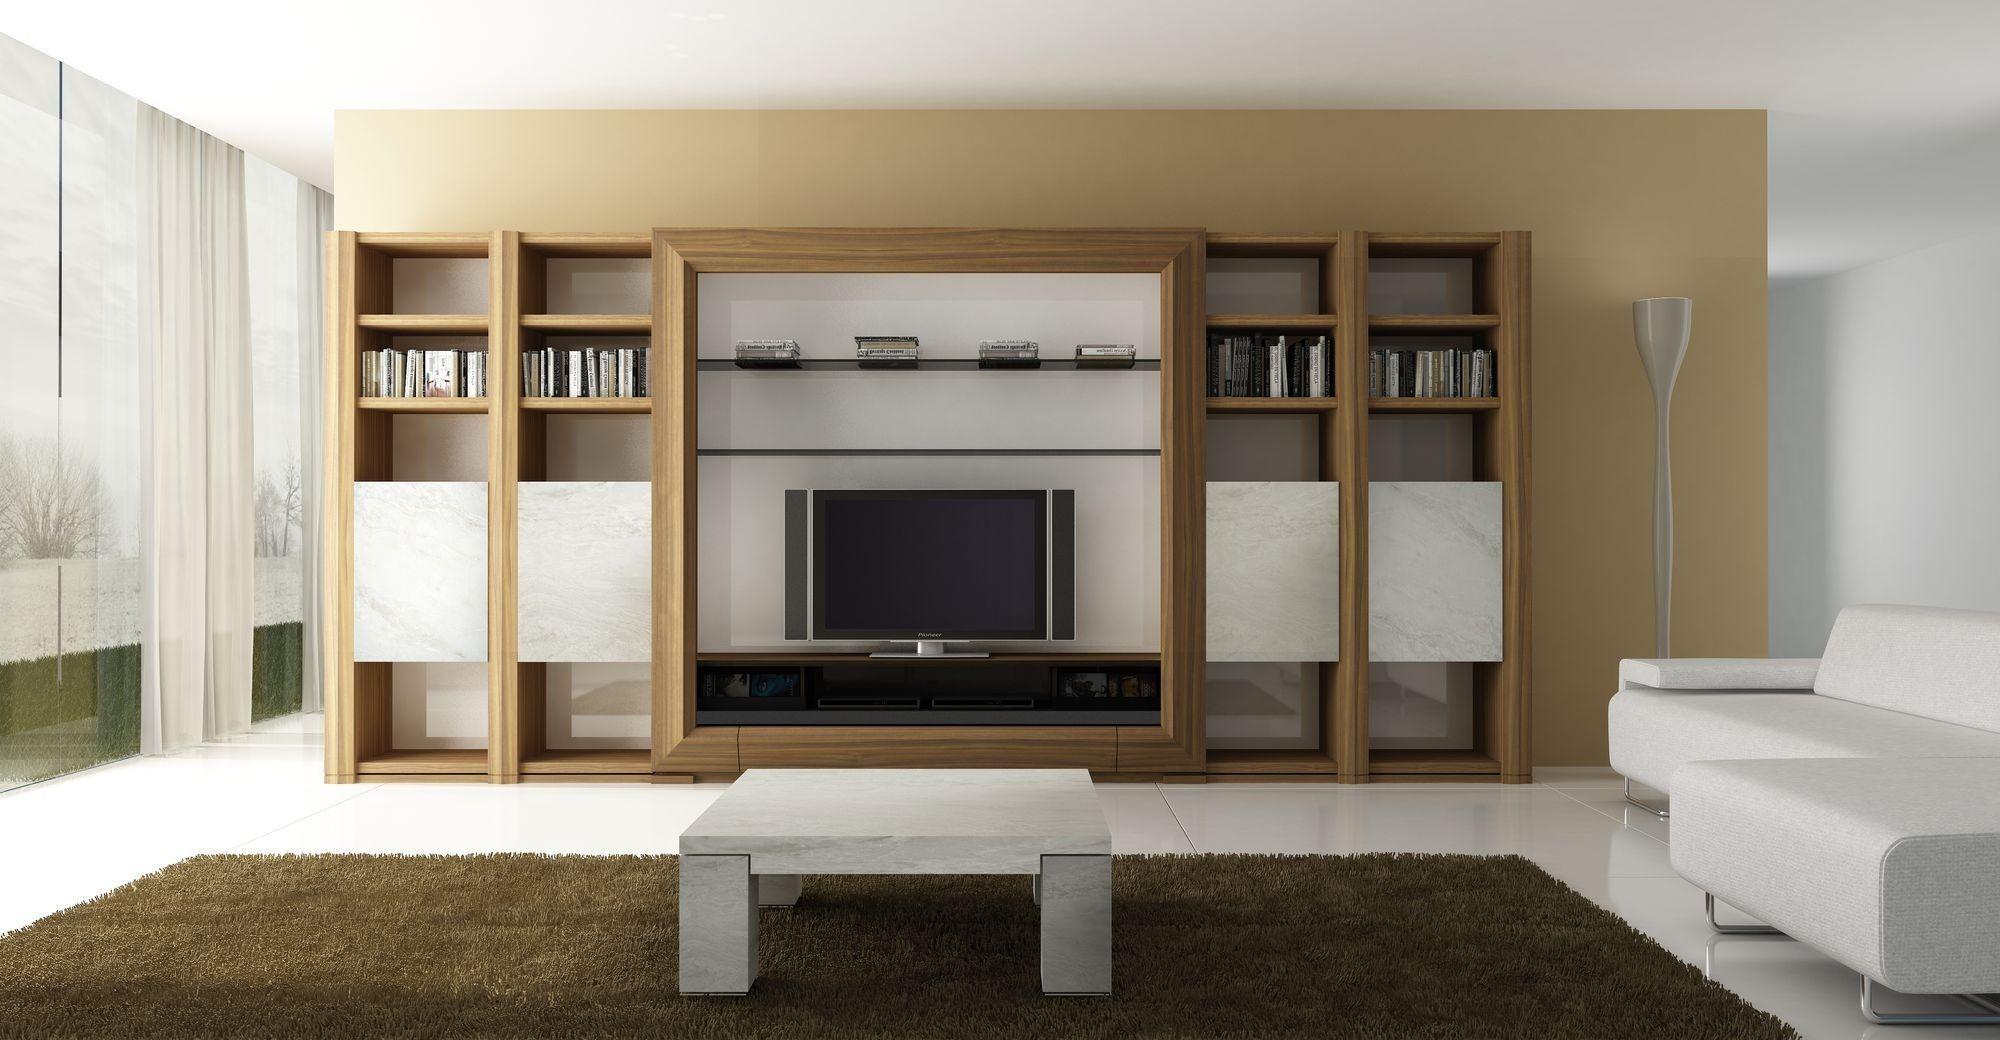 Contemporary Interior Storage Design With Modern Wall Units Modern